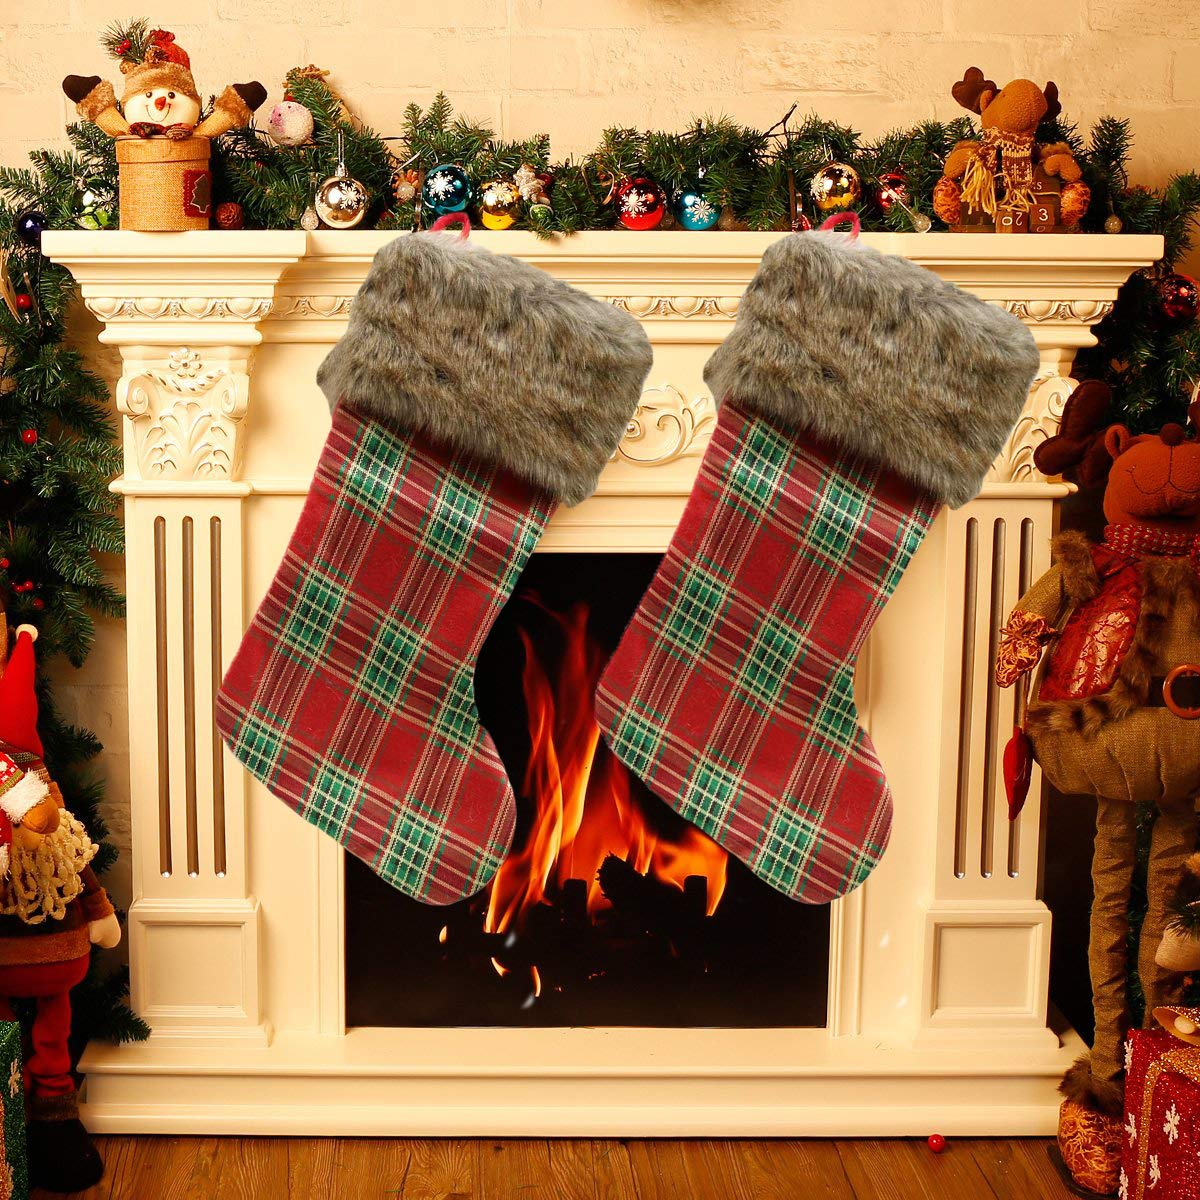 SDKBVOC 2 Pcs Set Big Size Classic Christmas Stockings for Decoration, Classic Style Plaidwith Holiday Spirit Cardinal Personalized Christmas Stocking